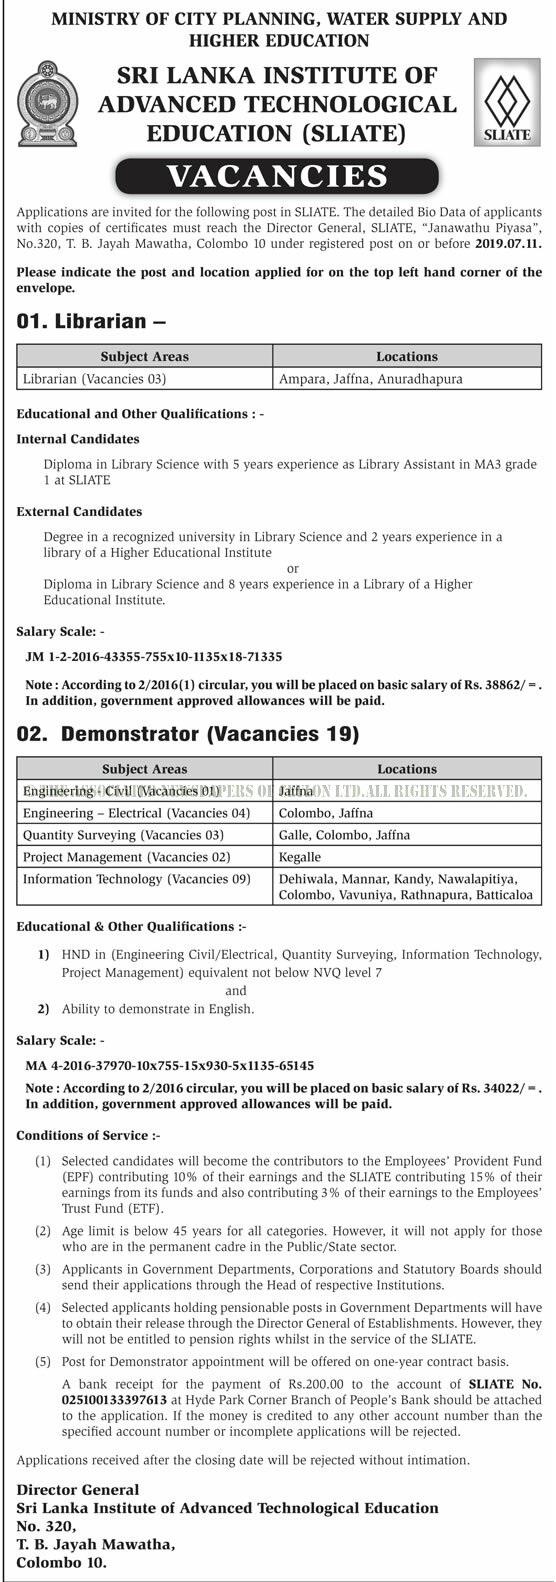 Vacancies at Sri Lanka Institute of Advanced Technological Education